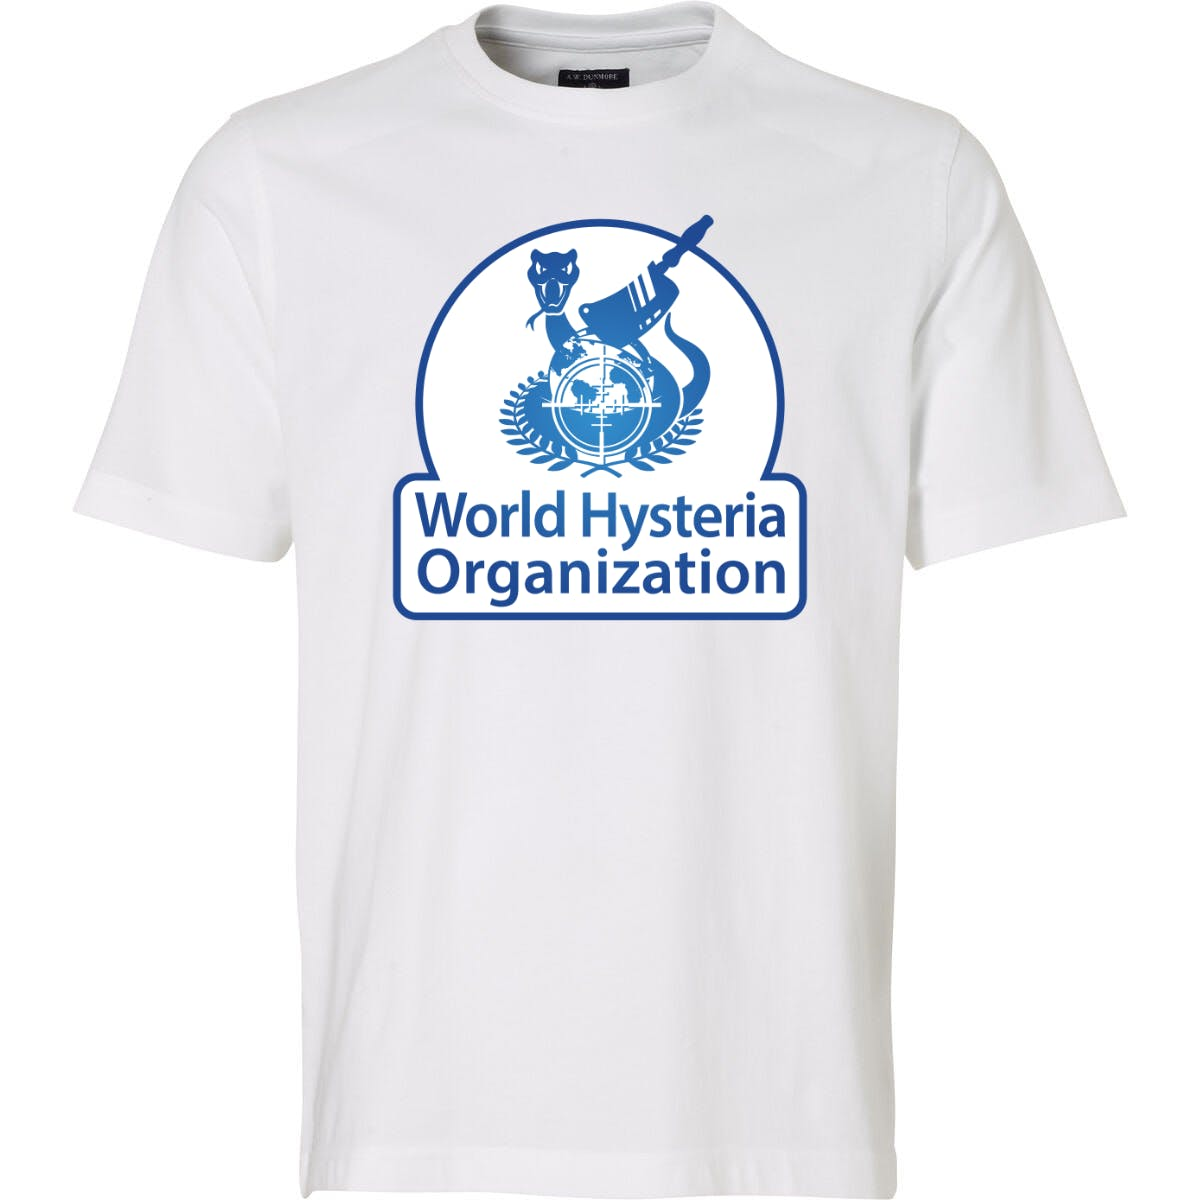 T-Shirt: Word Hysteria Organisation (Pandemimimi)